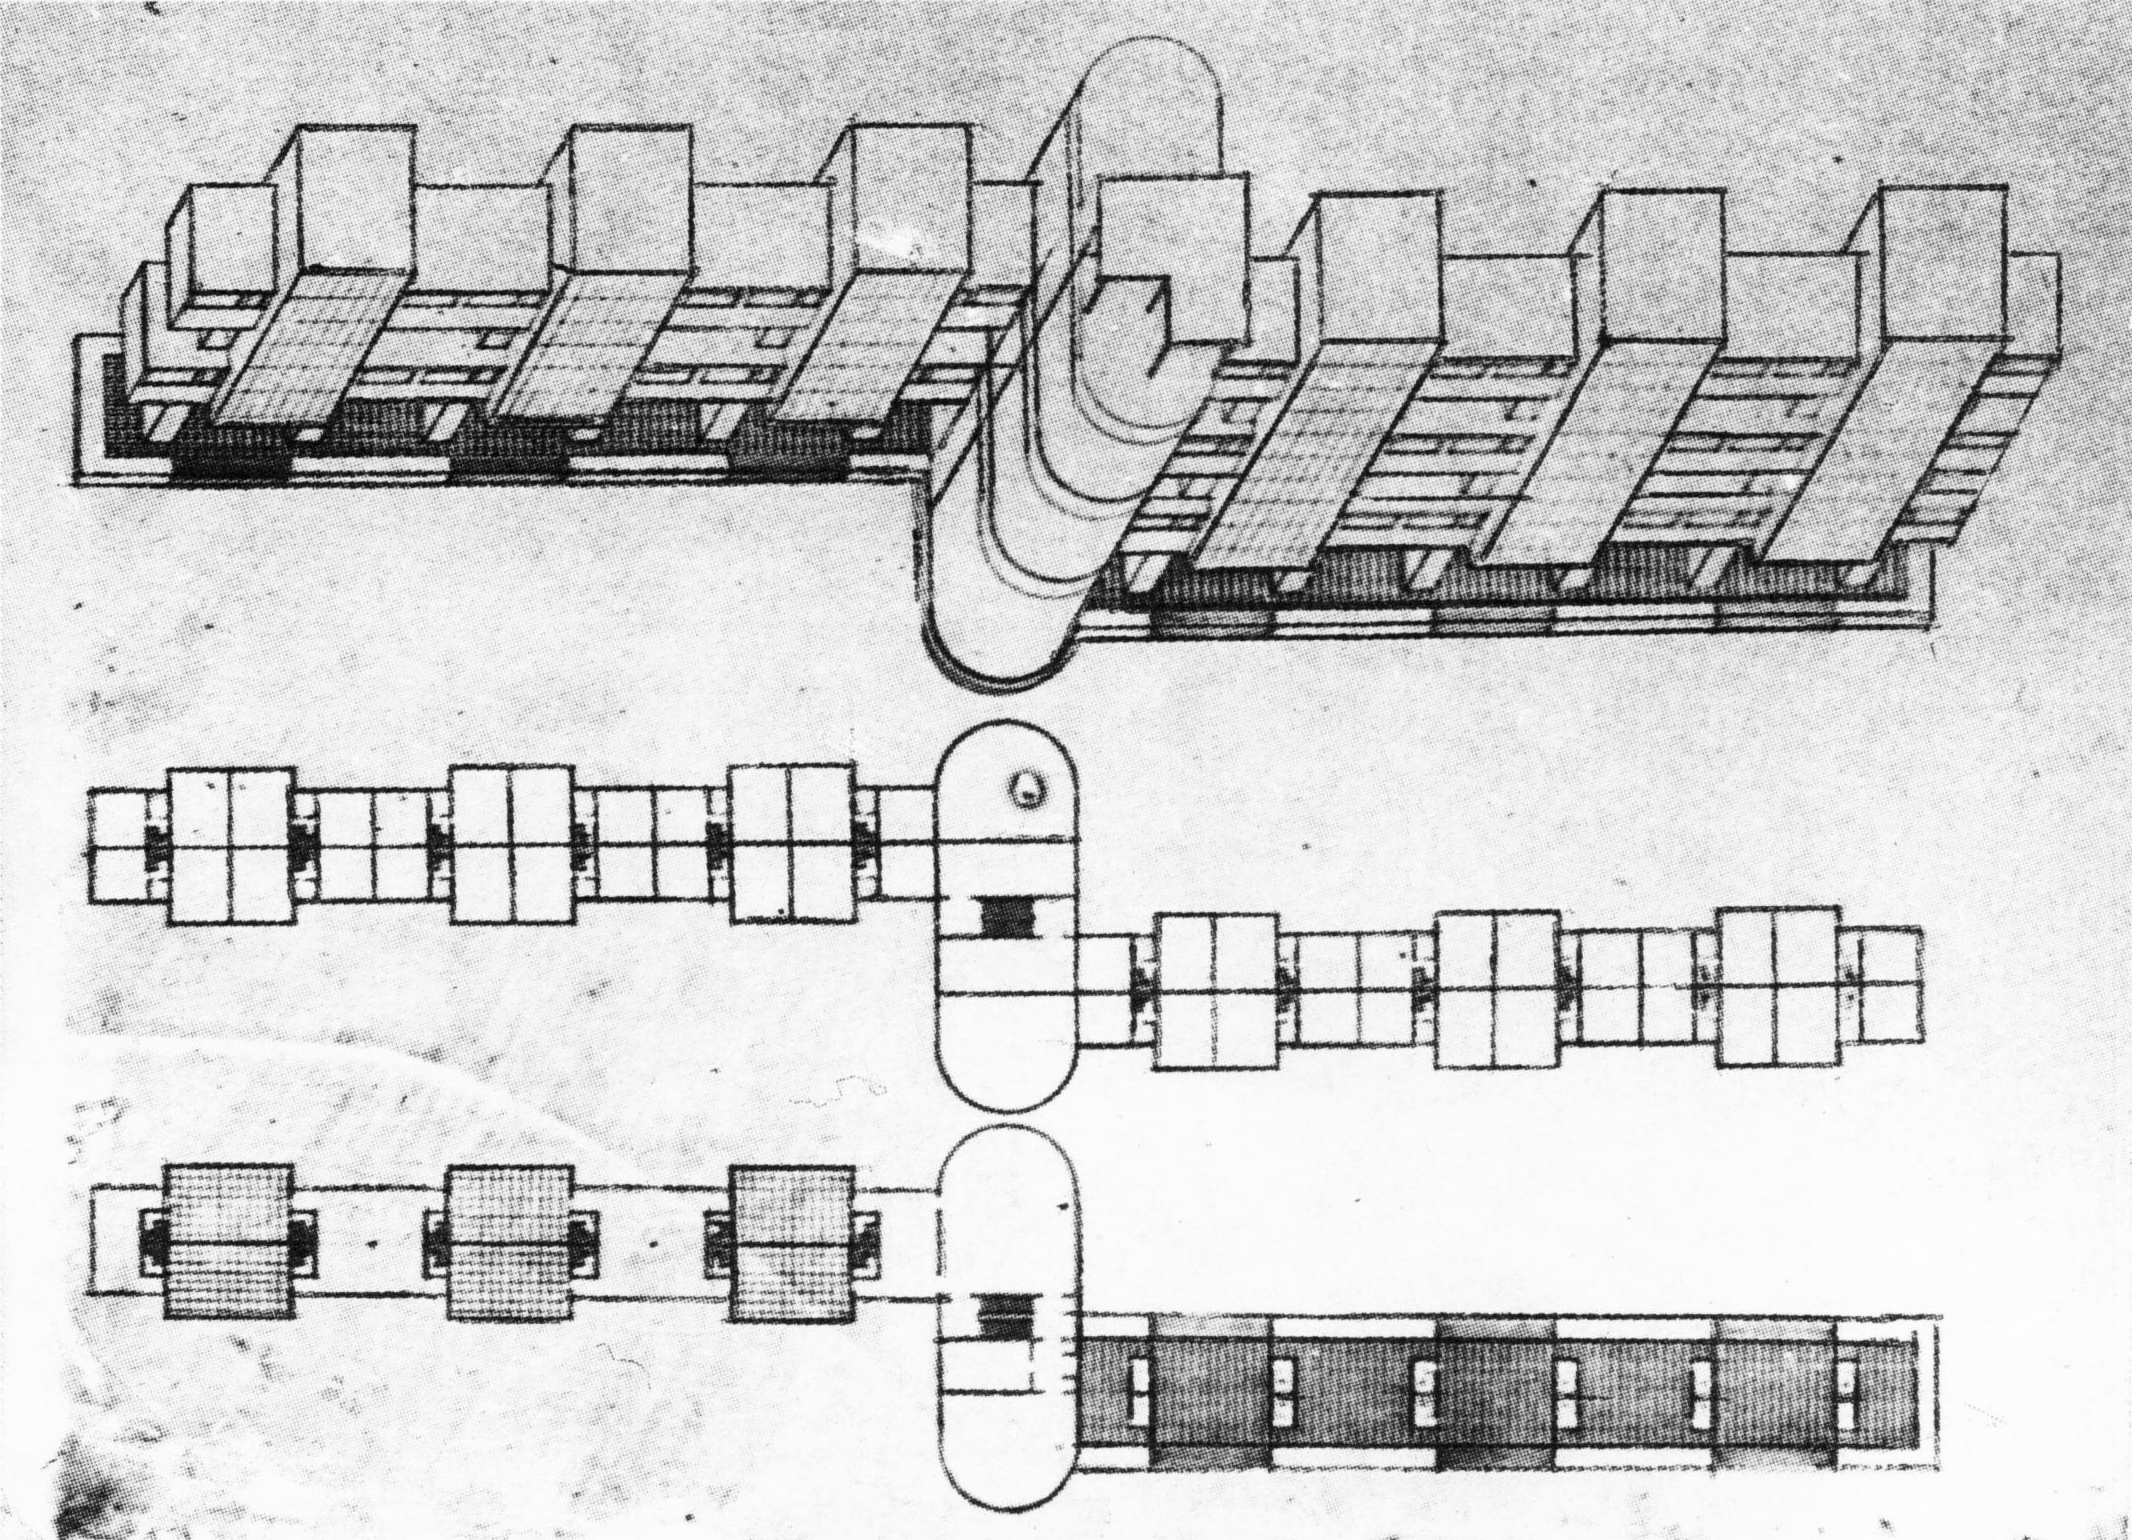 V. Popov, Diploma project on the theme of the %22New City%22 (1928), studio of Nikolai Ladovskii, living complex, axonometric and plan